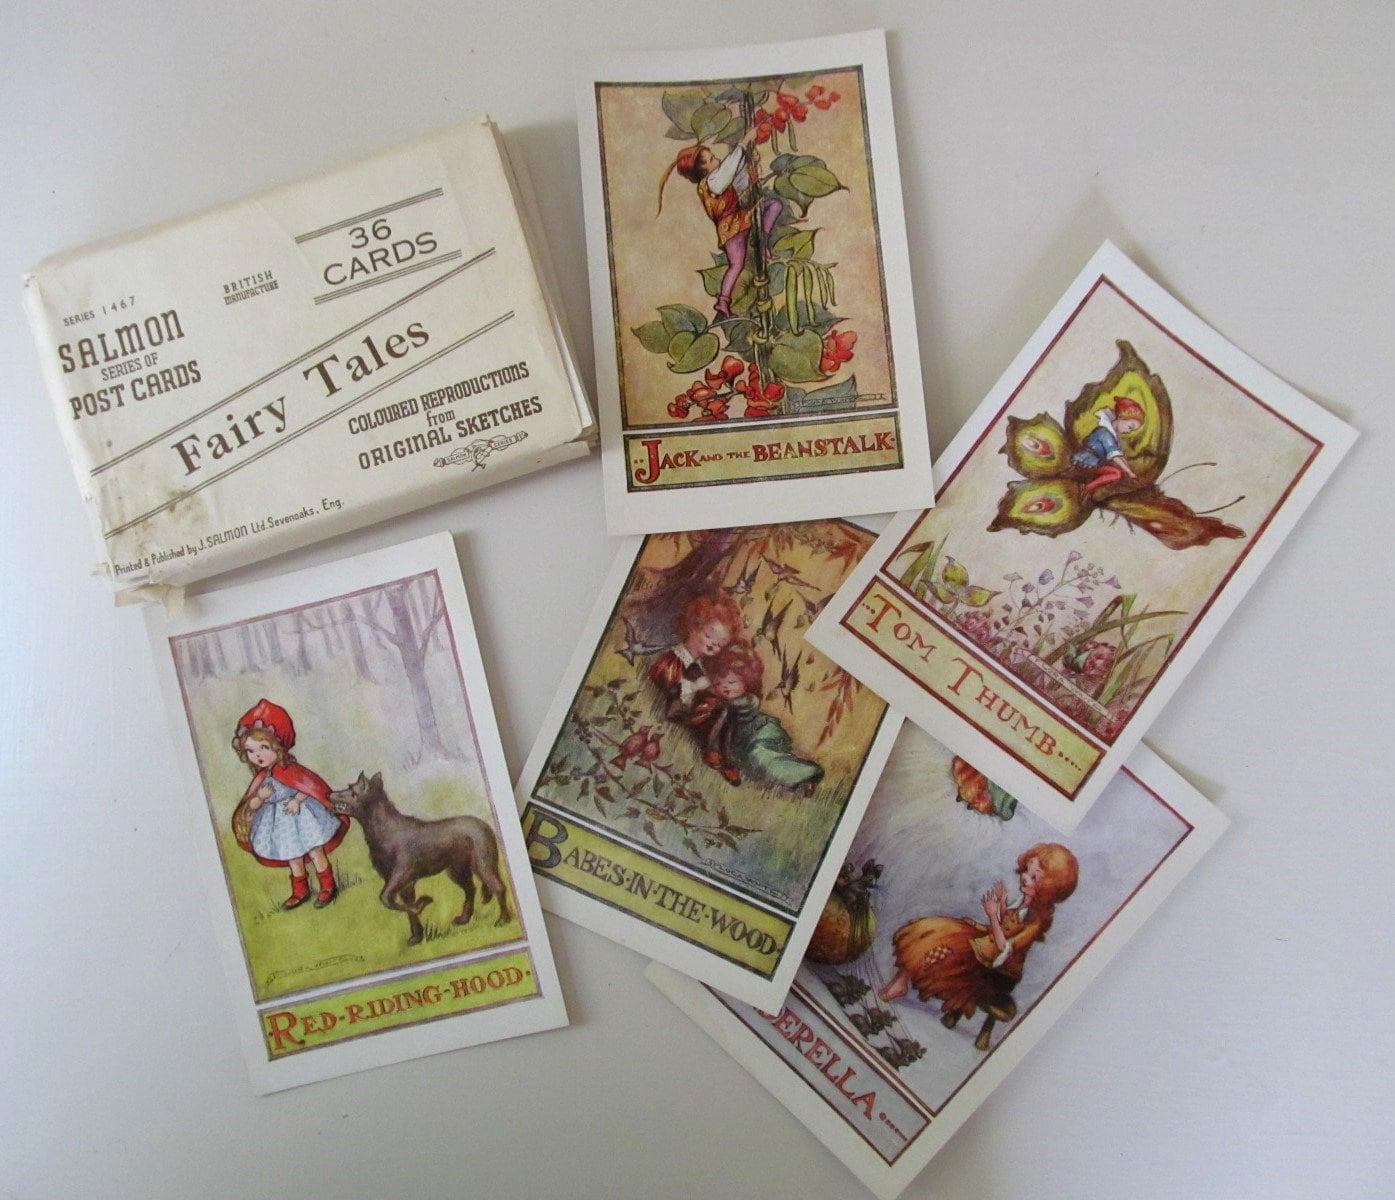 Superbe collection de conte 36 rare VINTAGE utilisé conte de de fées ...